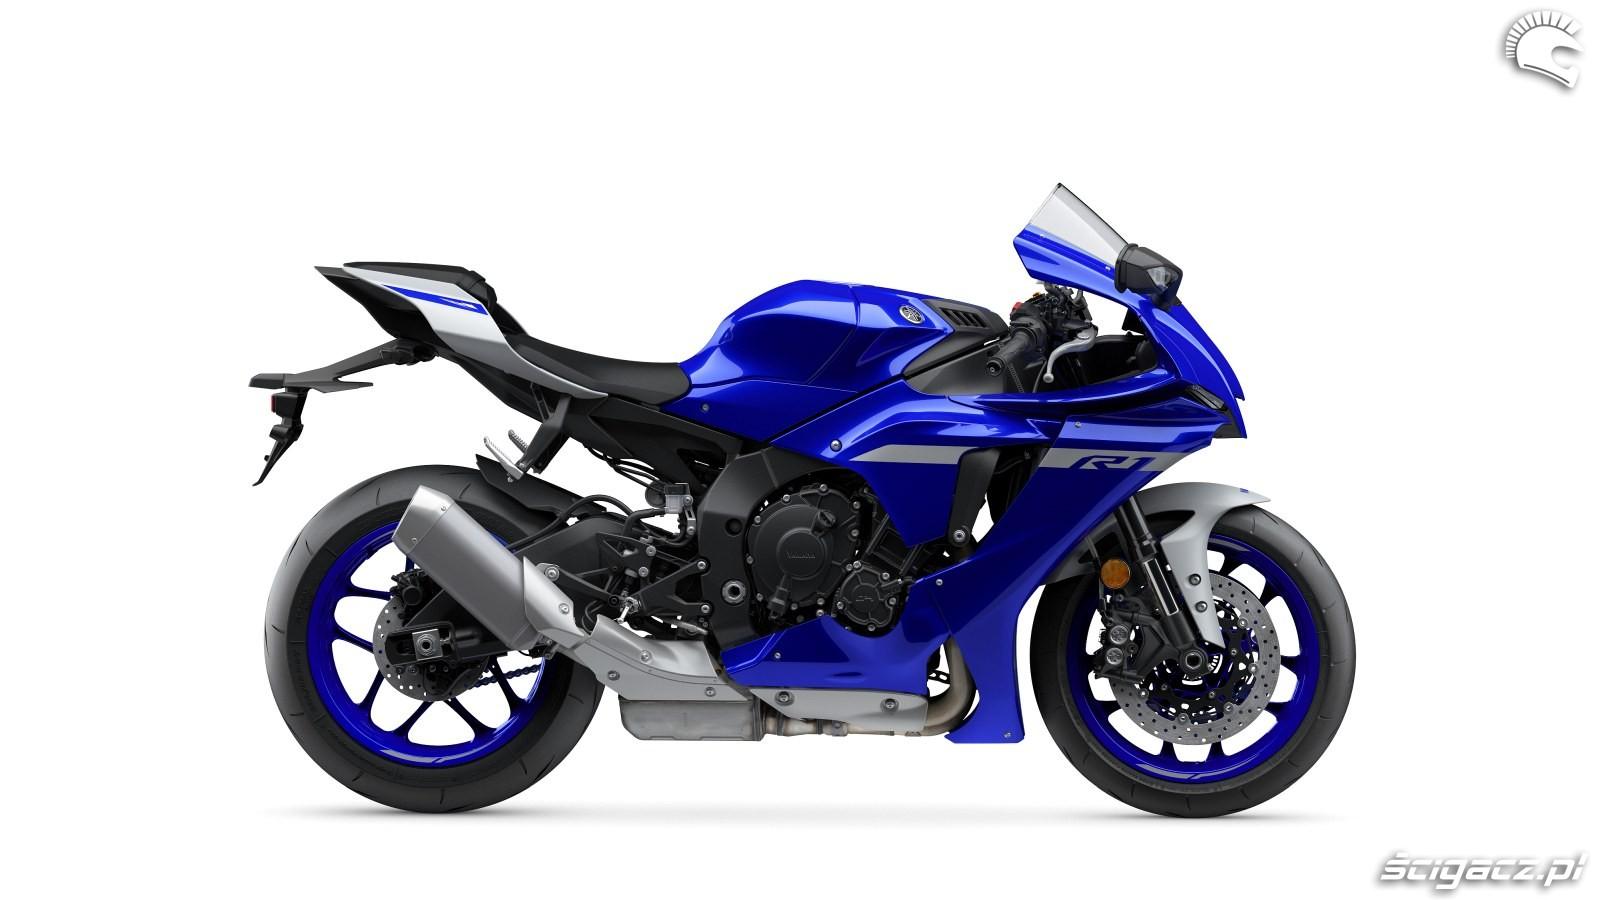 103 Yamaha R1 2020 studio 5